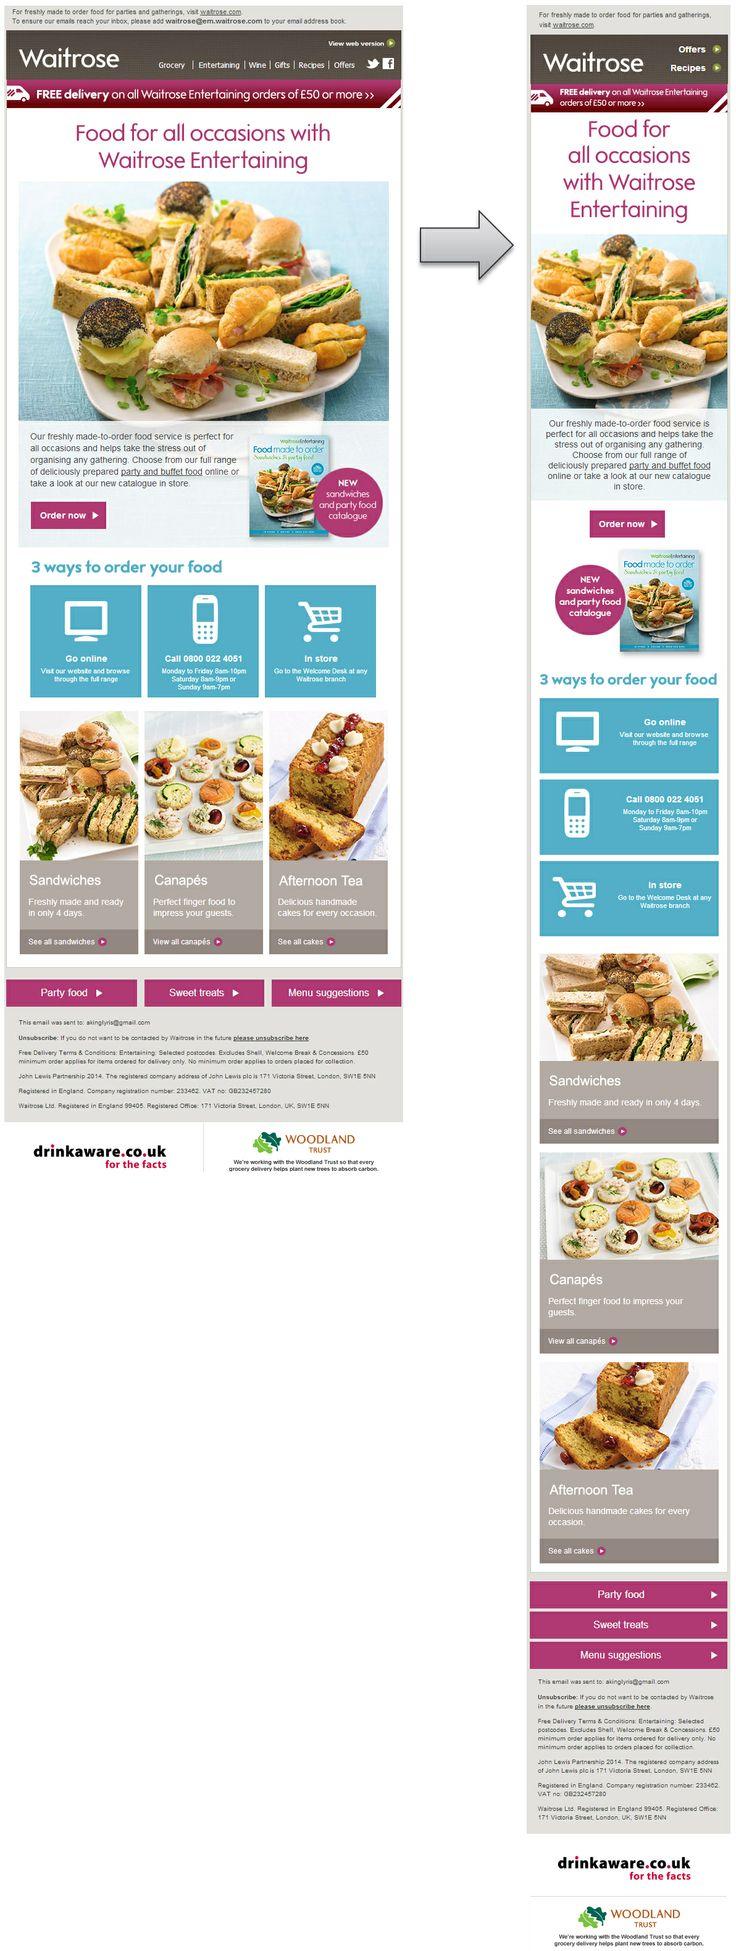 Responsive Email Design from Waitrose #ResponsiveEmailDesign